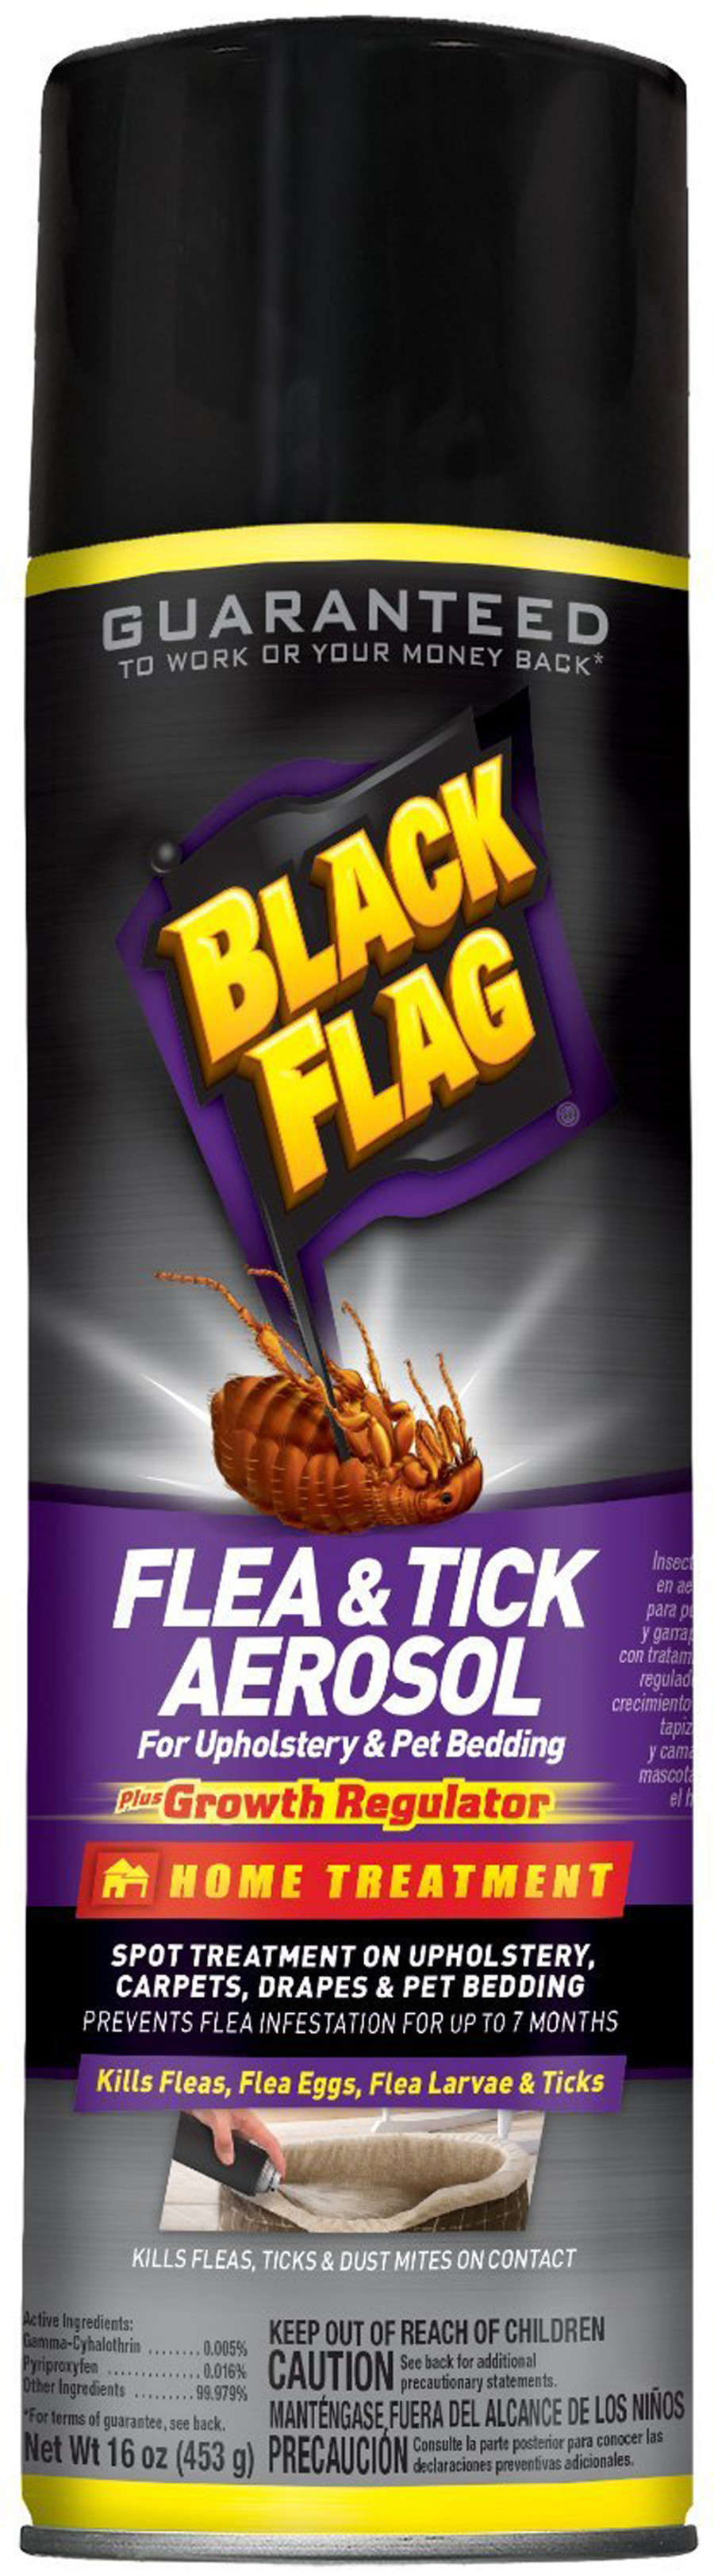 Black Flag Flea & Tick Spray Aerosol for Upholstery & Pet Bedding 12ea/16 oz